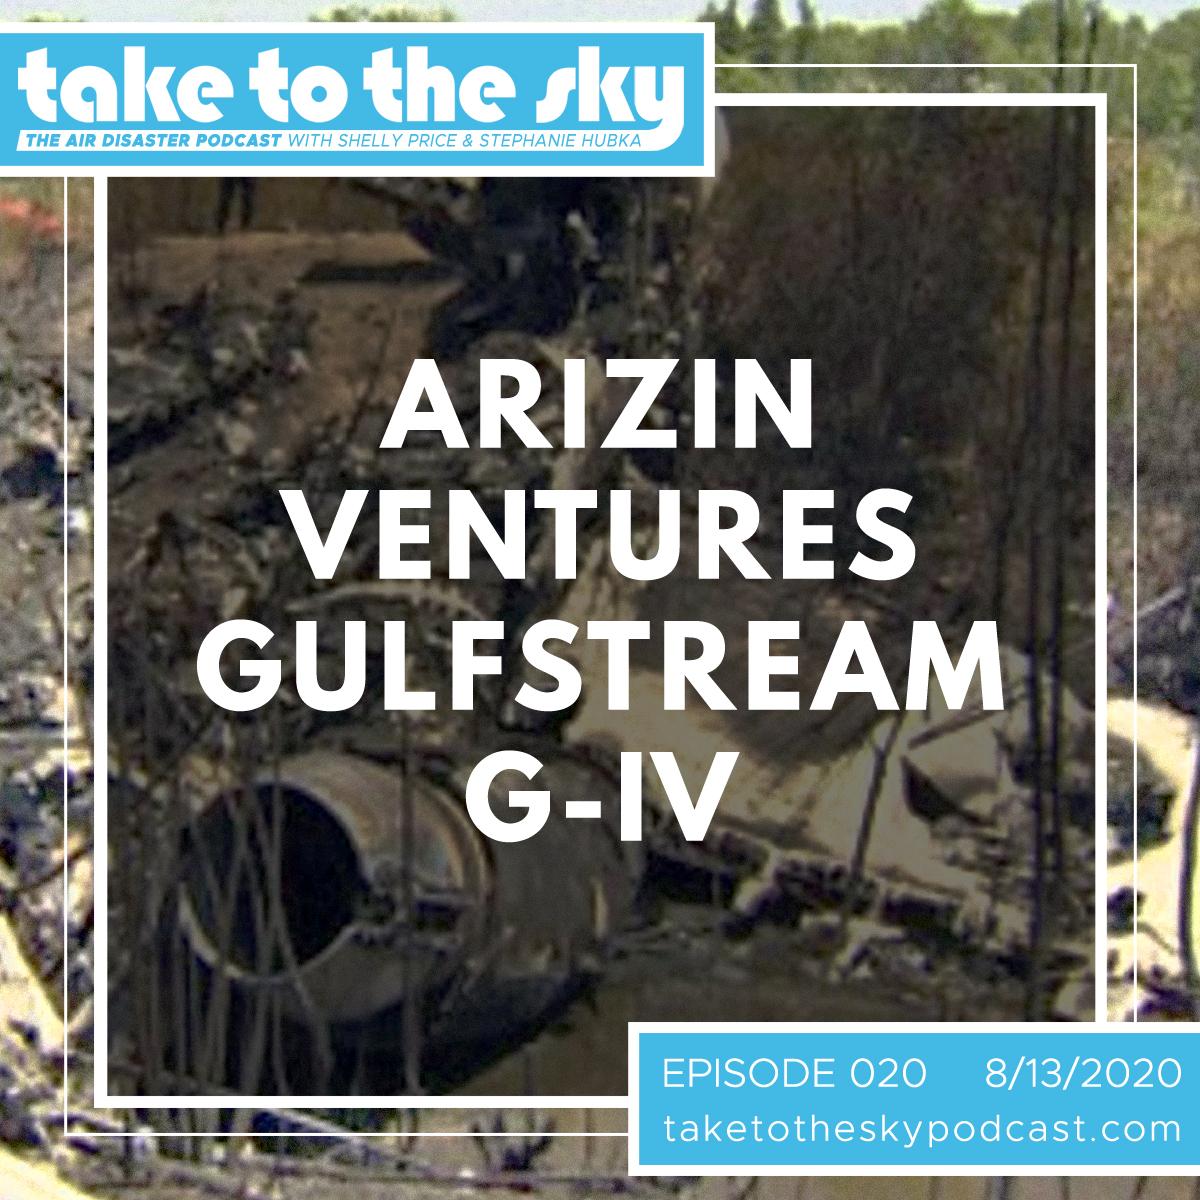 Take to the Sky Episode 020: Arizin Ventures Gulfstream G-IV